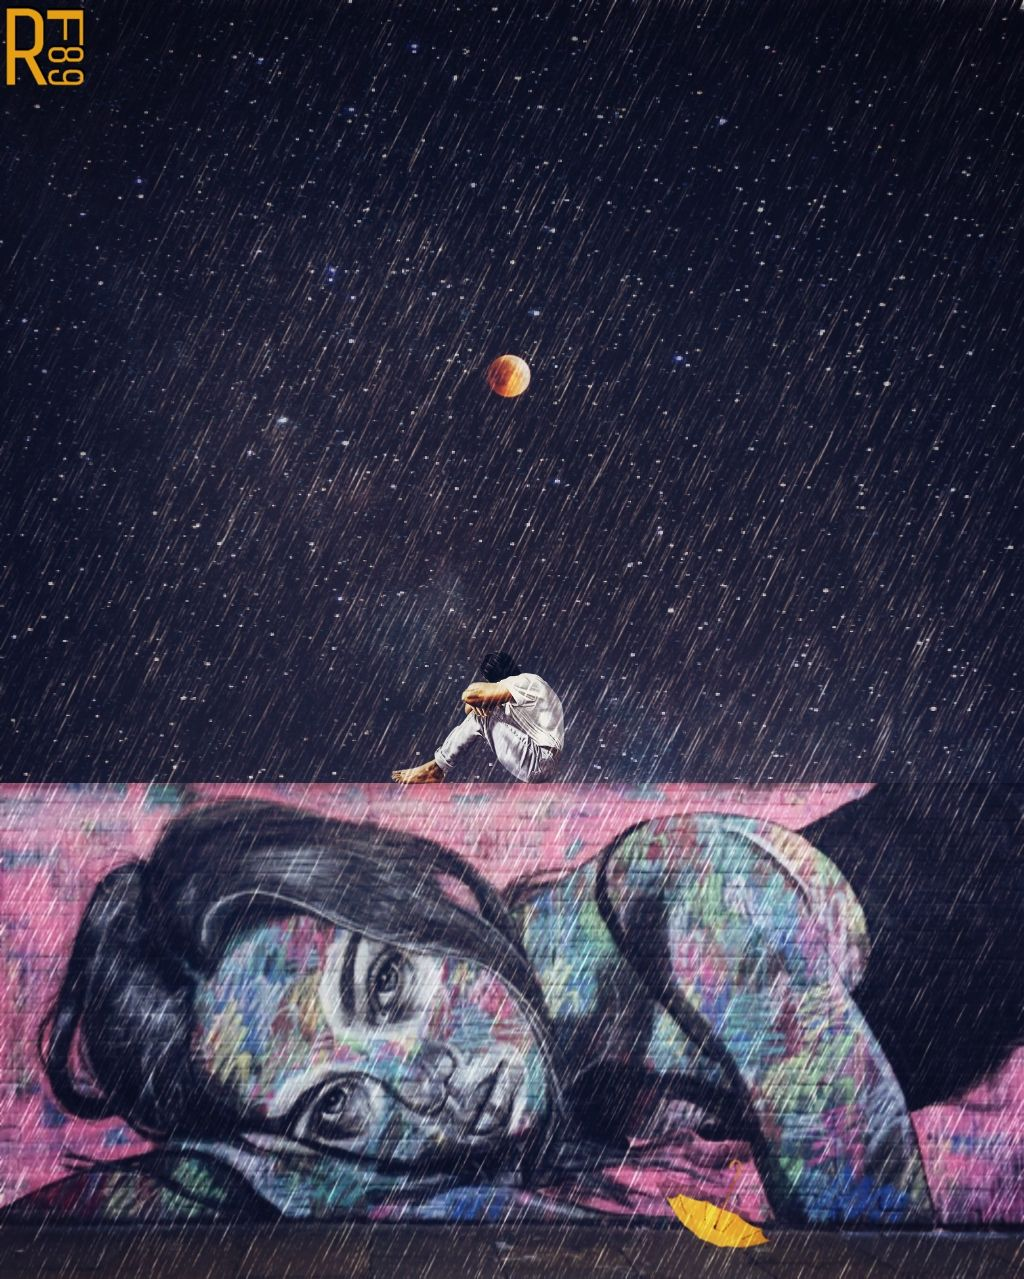 MISS YOU  Goodnight 👍😉  #manipulation #doubleexpousure #editstepbystep #rf89 #fantasy #picsartedits #splash #italy #interesting #art #myedit #edit #editedbyme #editedbypicsart #madewithpicsart